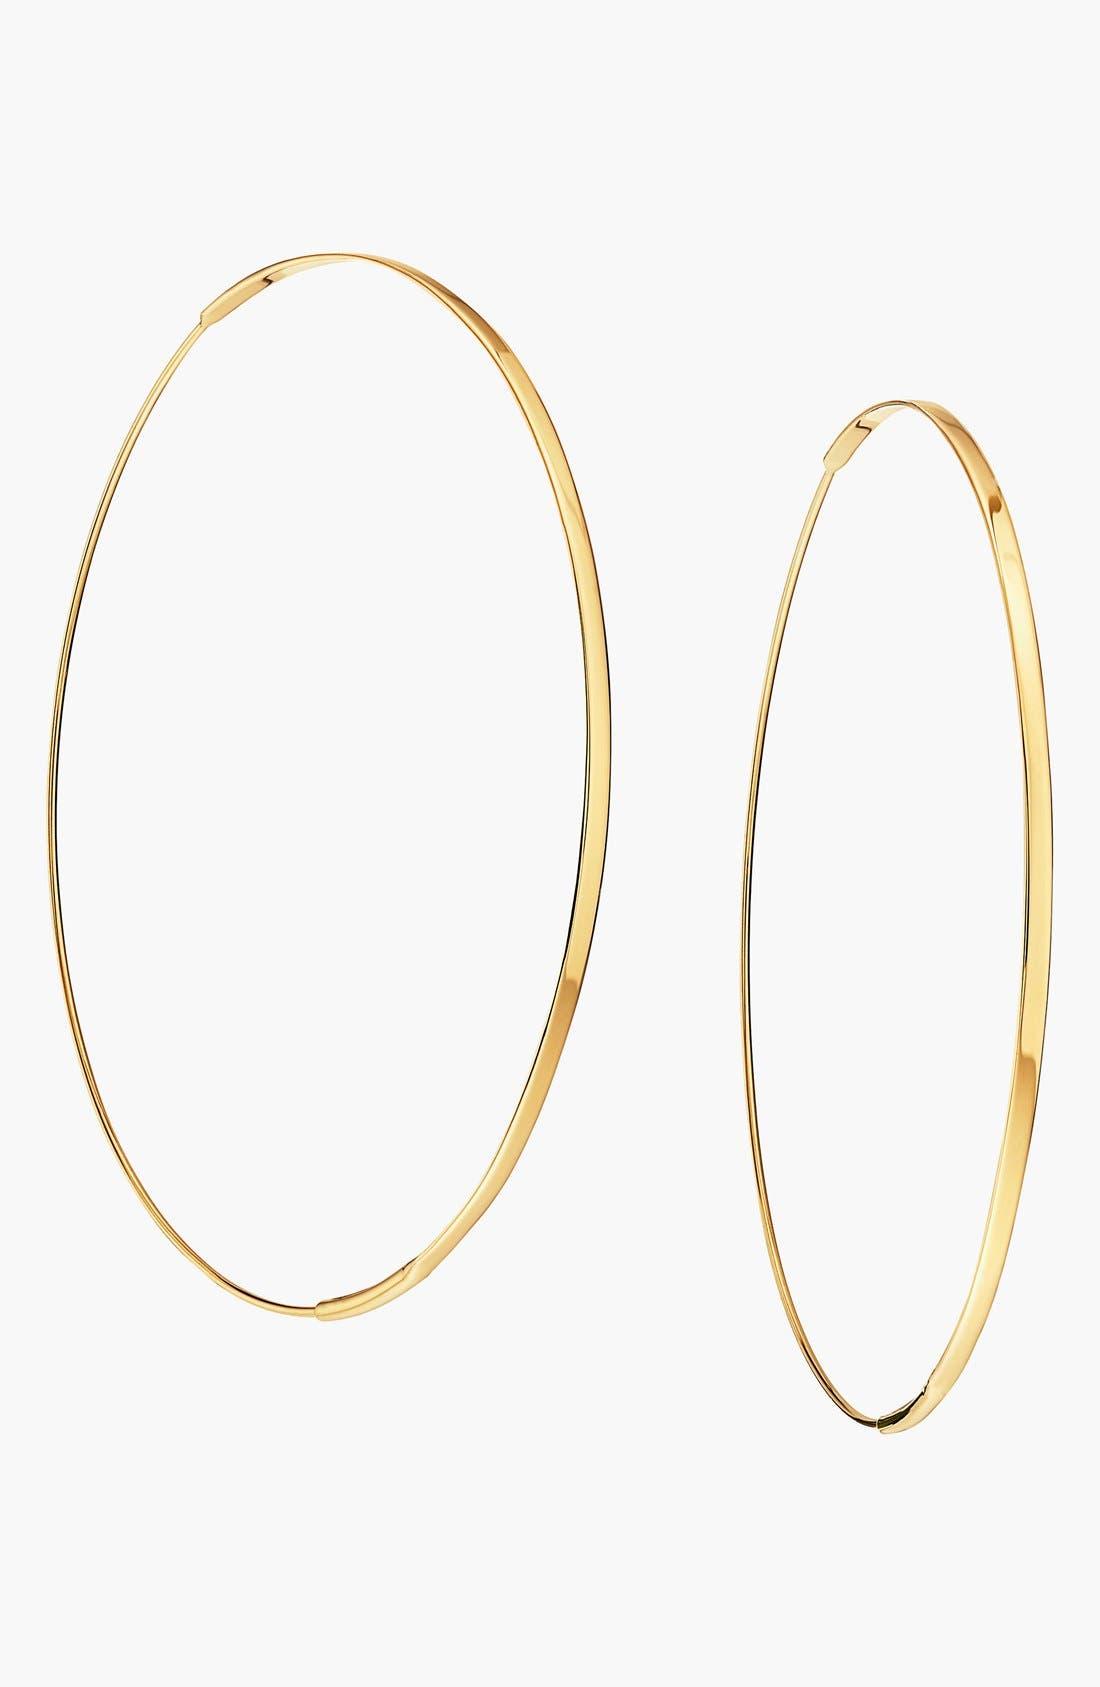 'Large Flat Magic' Hoop Earrings